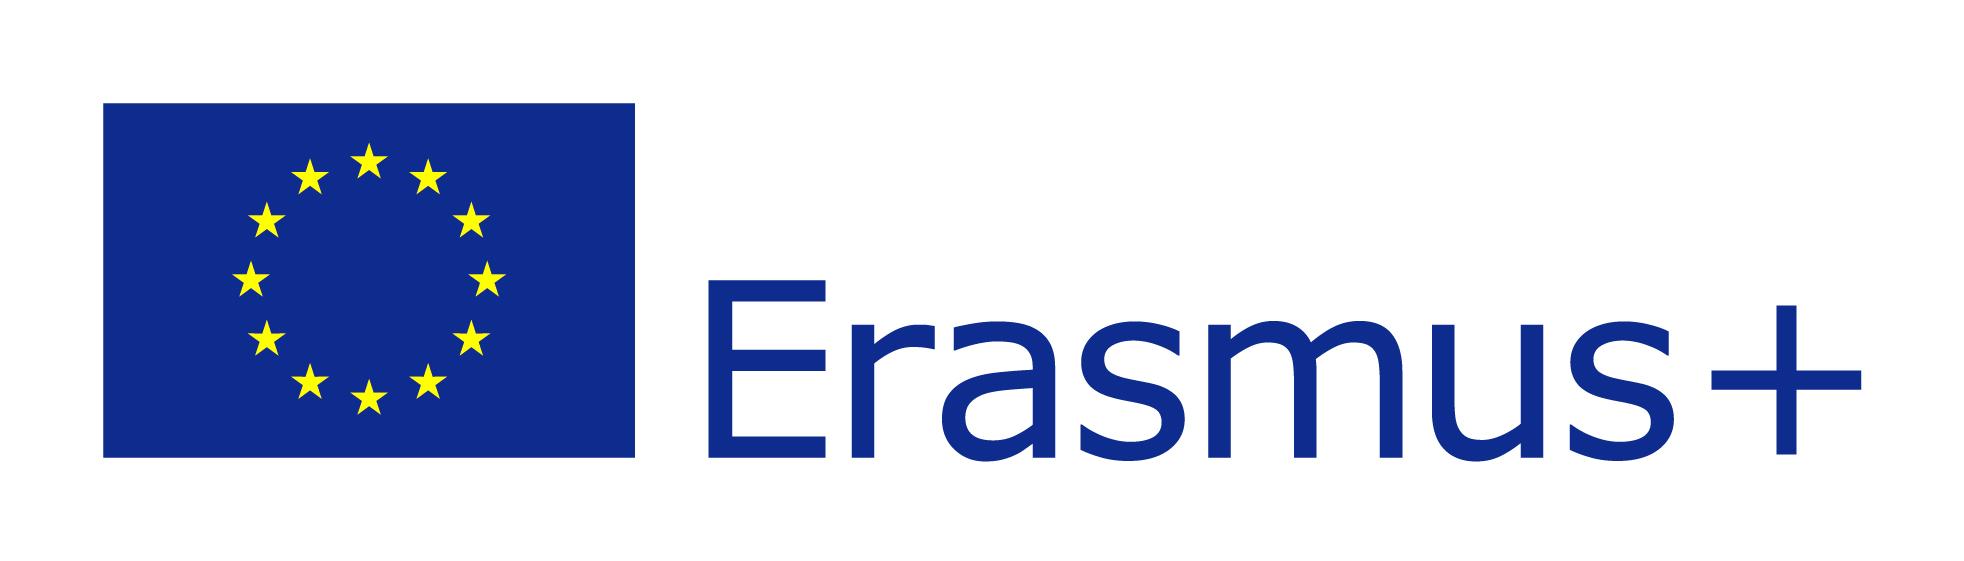 Erasmus + -logo.